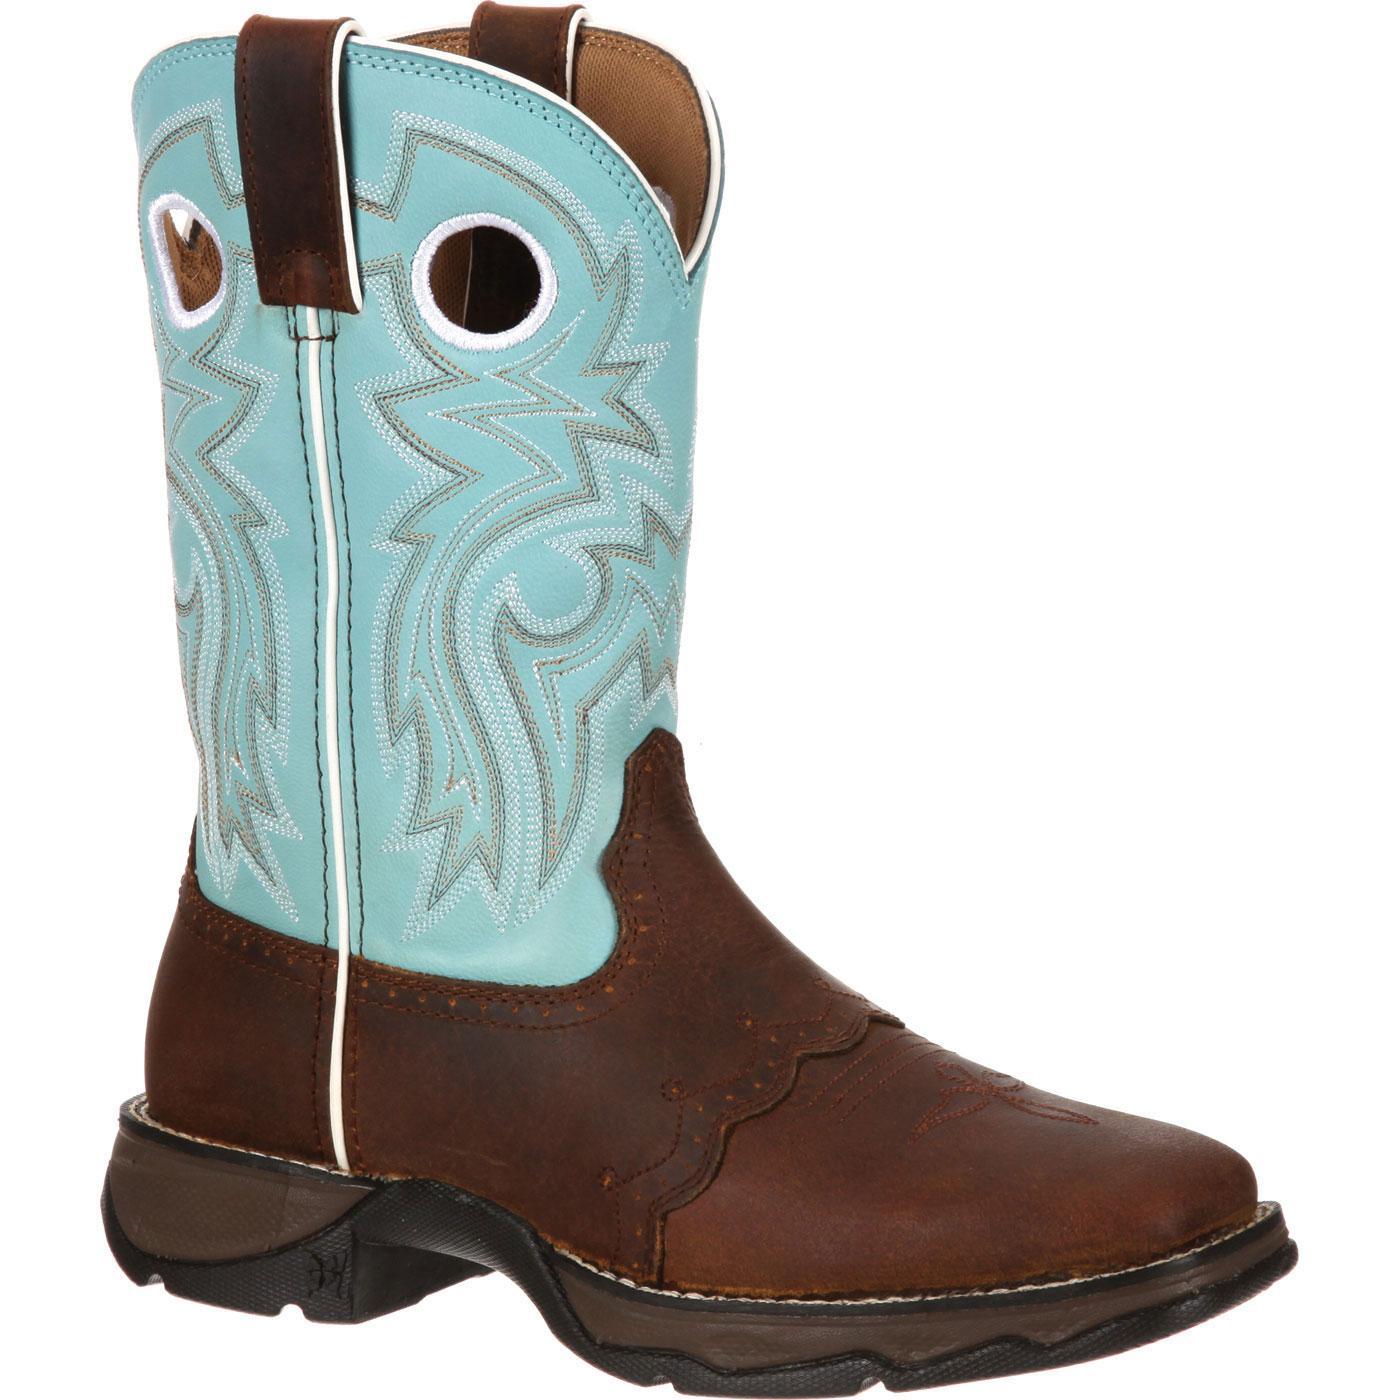 discount footlocker pictures Durango Lady Rebel Powder 'N ... Lace Women's Cowboy Boots outlet best sale LSku7YAwk